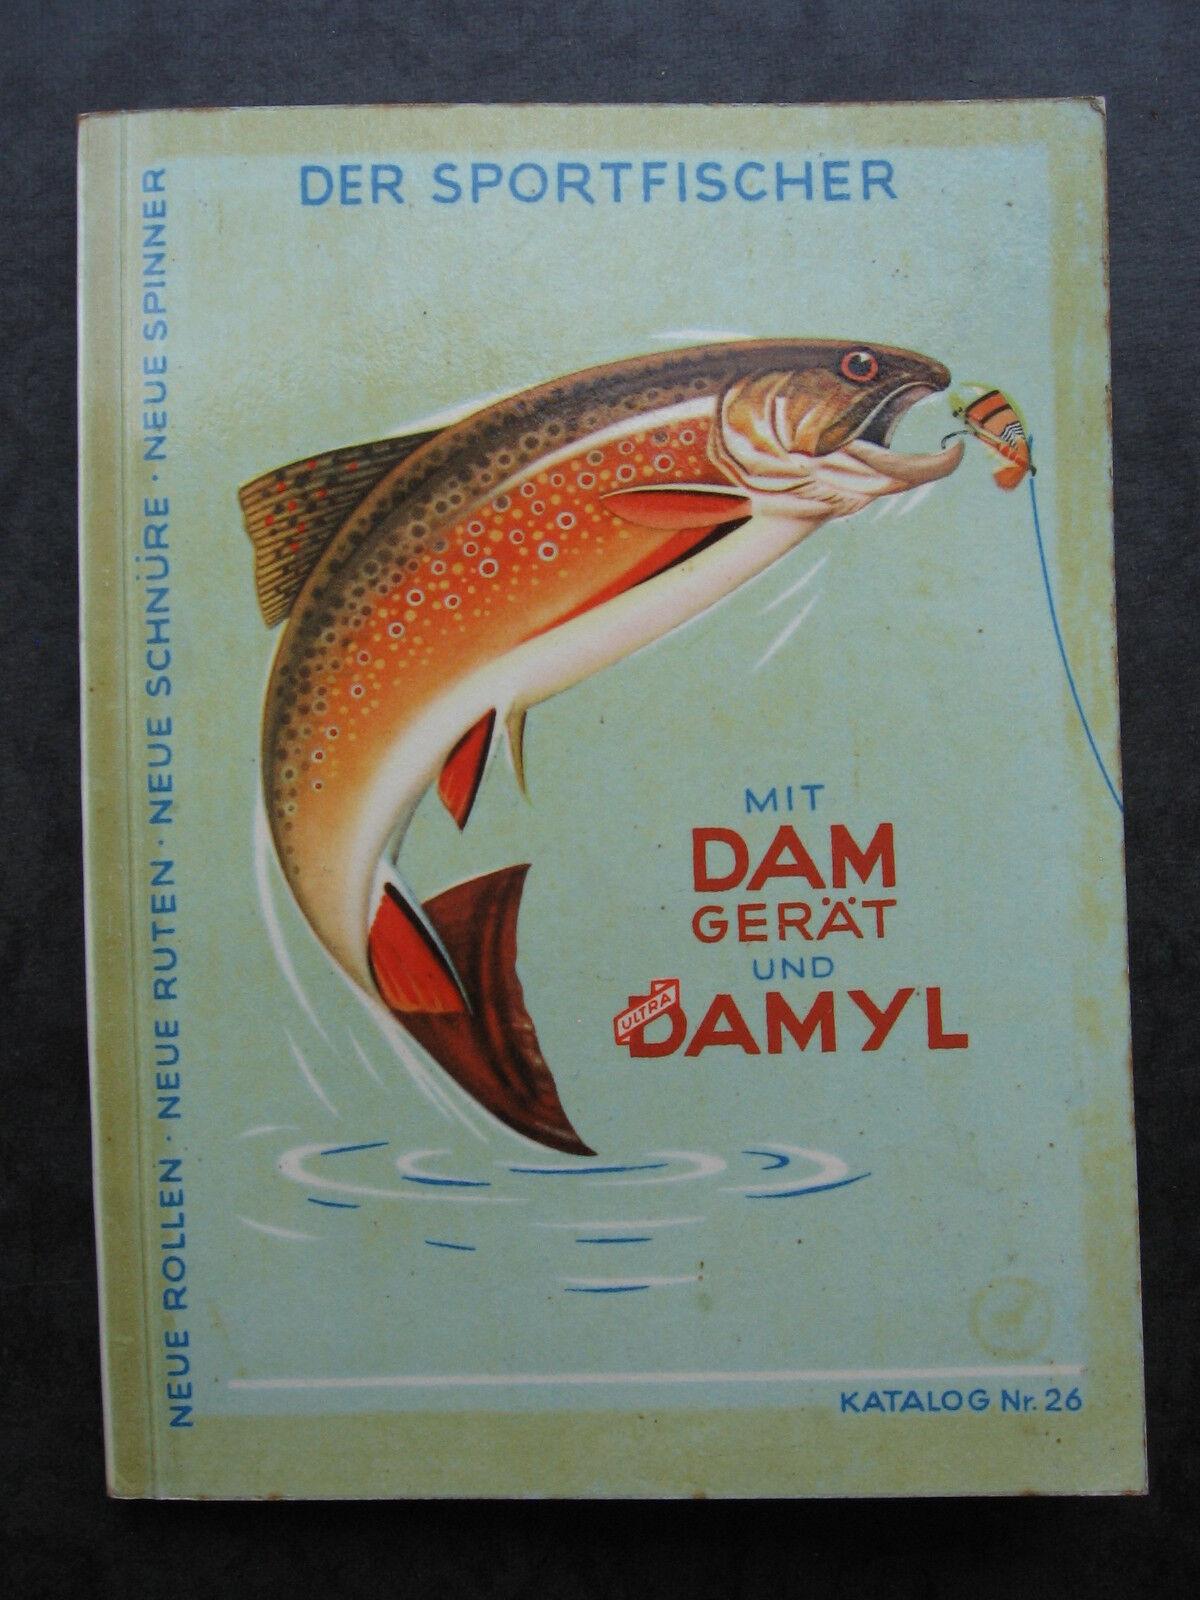 Dam Damyl Angel dispositivi CATALOGO N. 26 Angel catalogo con info scrivere 1958